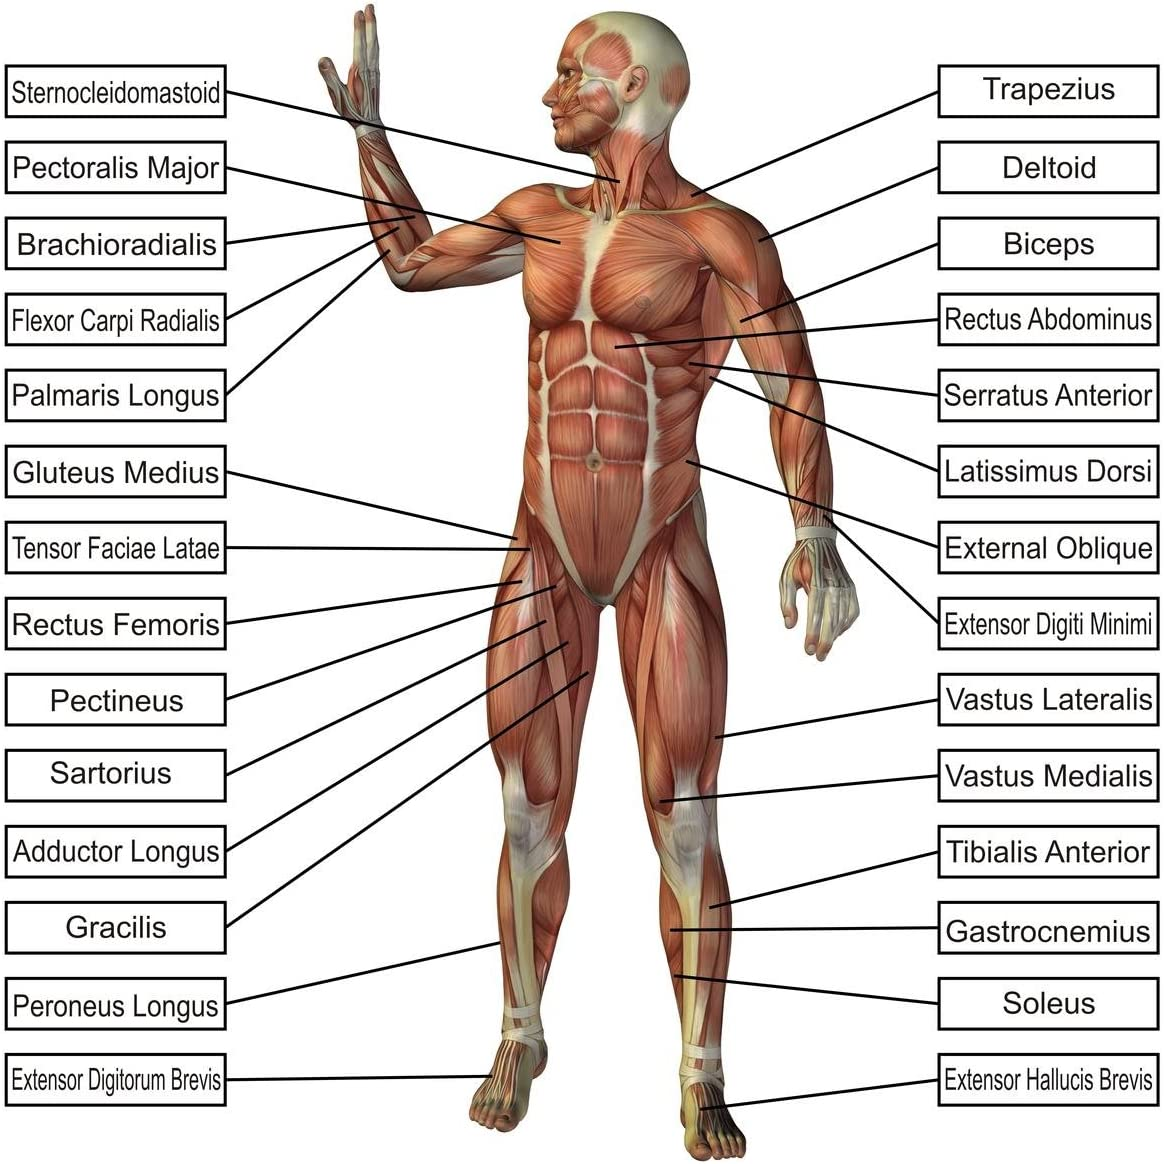 Amazon.com: LAMINATED 24x24 Poster: Anatomy Of Human Body Parts Body Parts  Names Human Anatomy Human Anatomy Diagram - Human Anatomy: Everything ElseAmazon.com